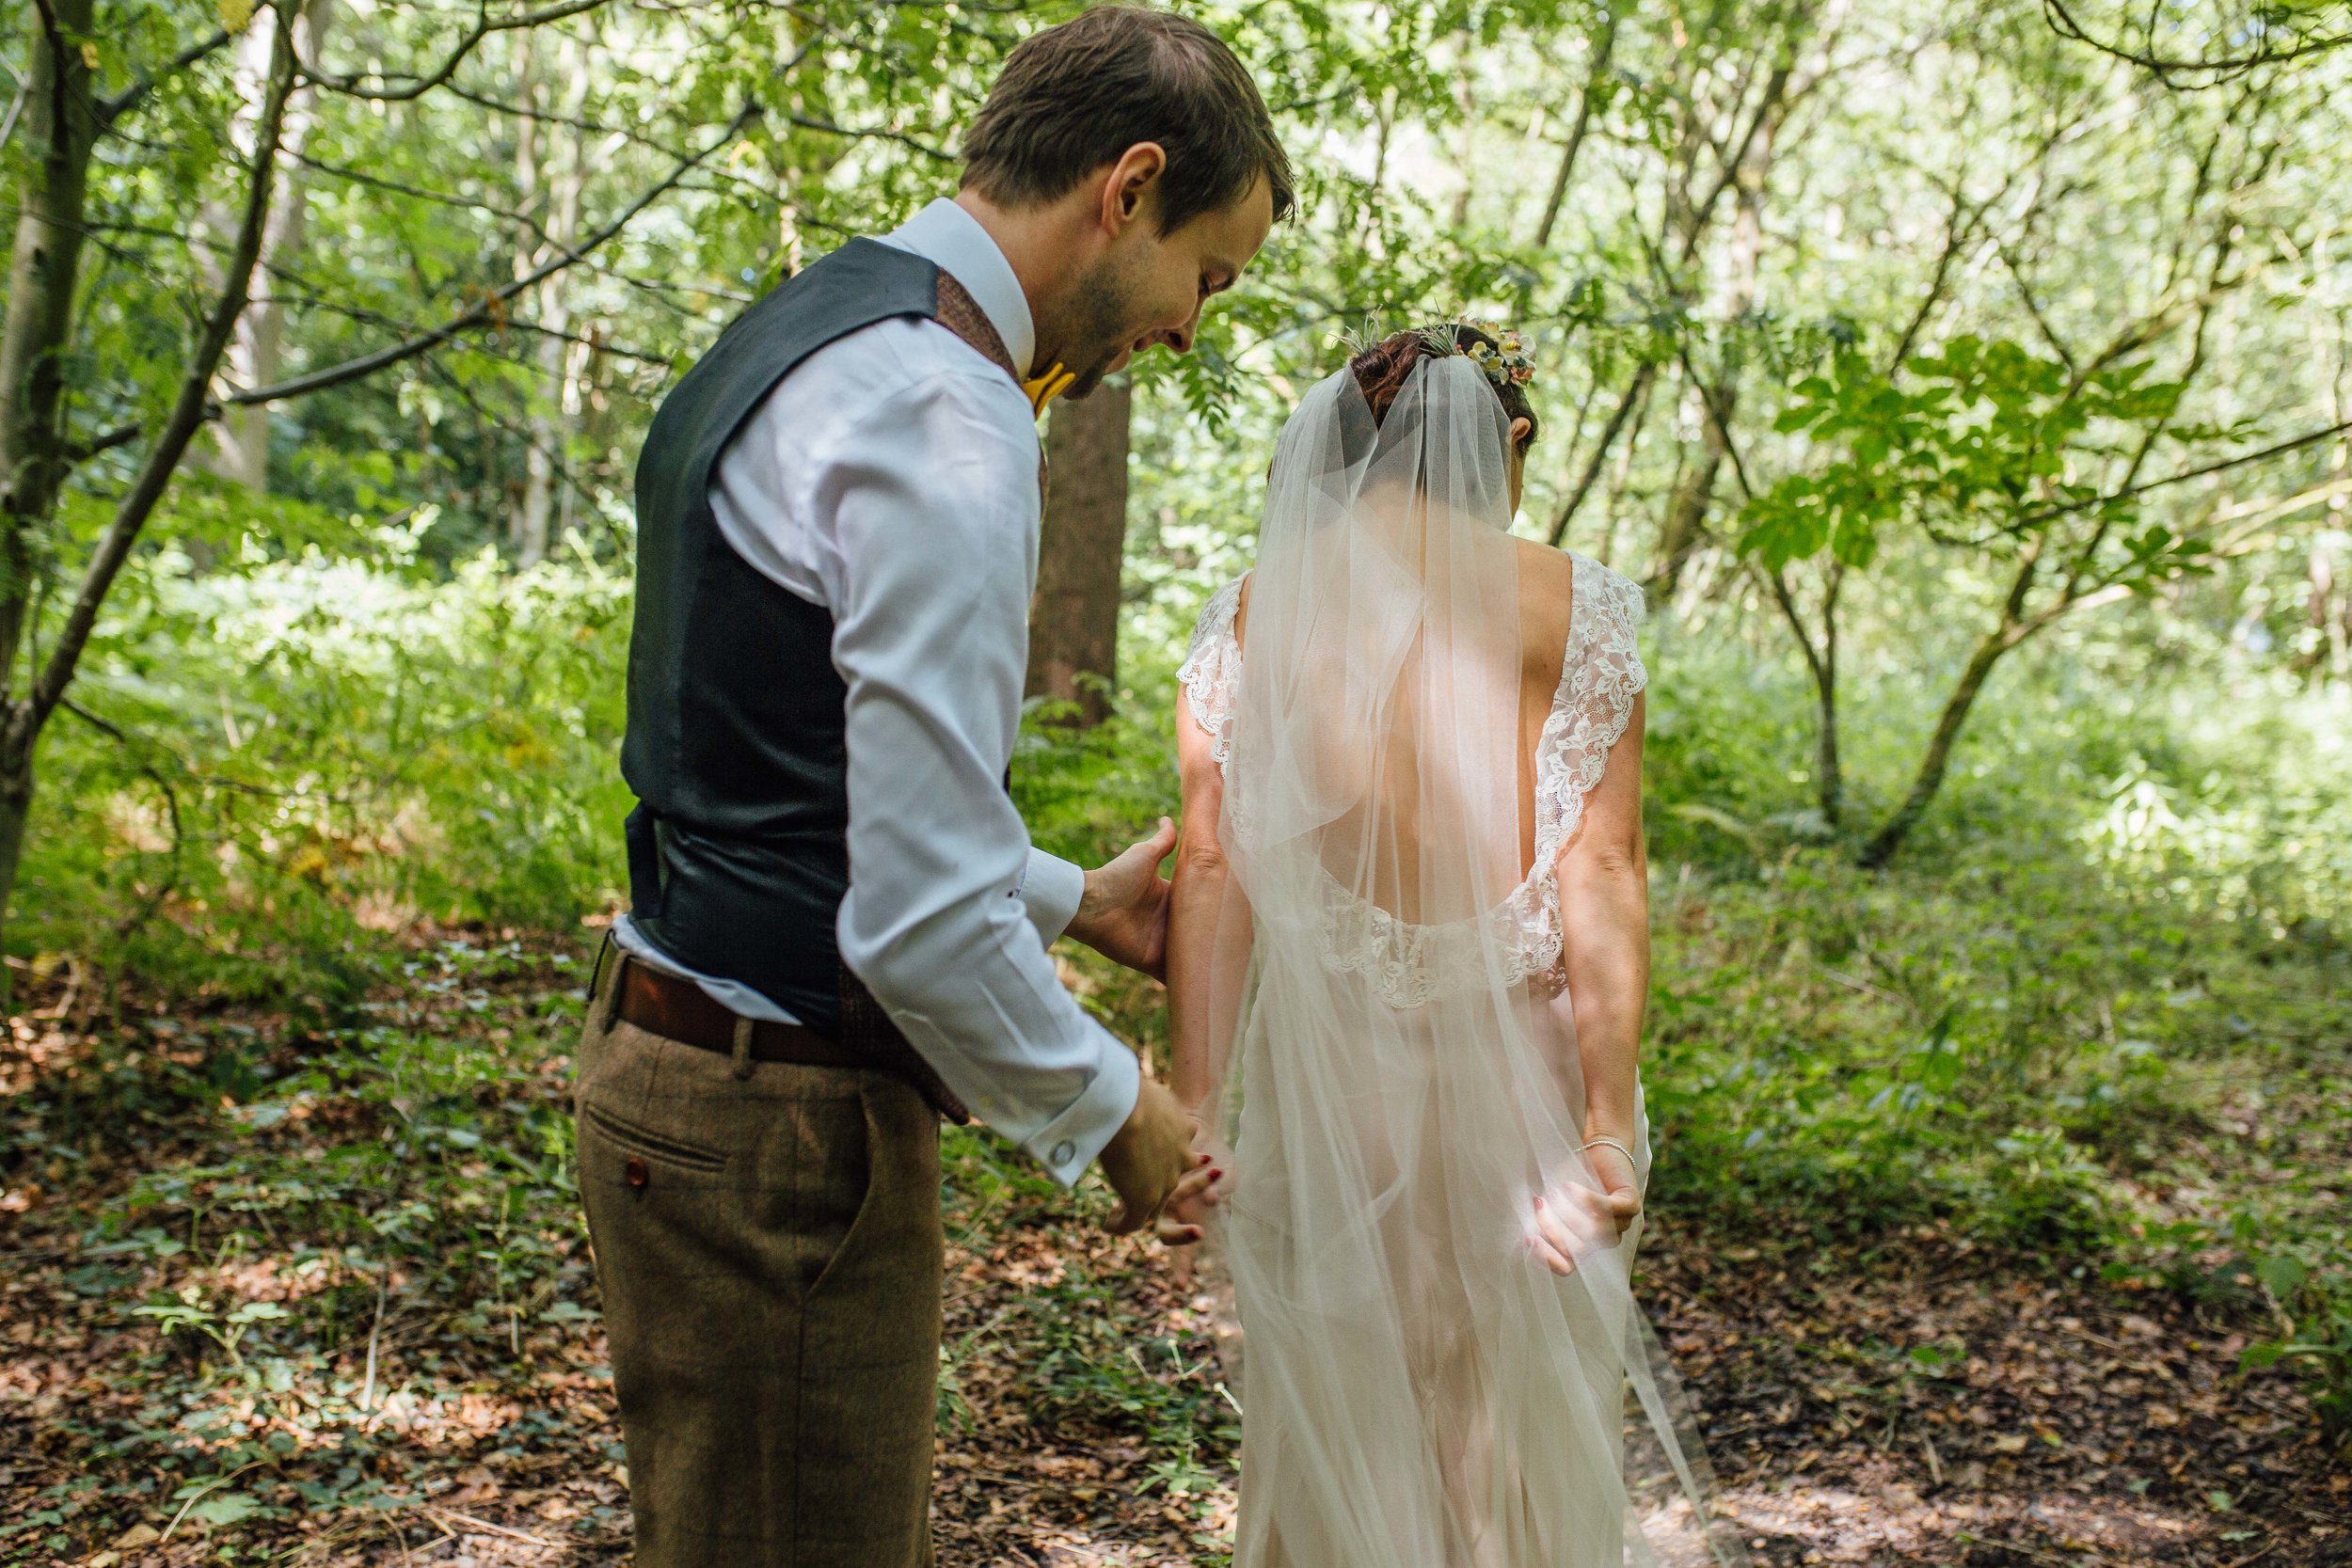 Katy-Bespoke-Veil-Sheffield-Wedding-Wes-Anderson-Susanna-Greening-Derbyshire-8